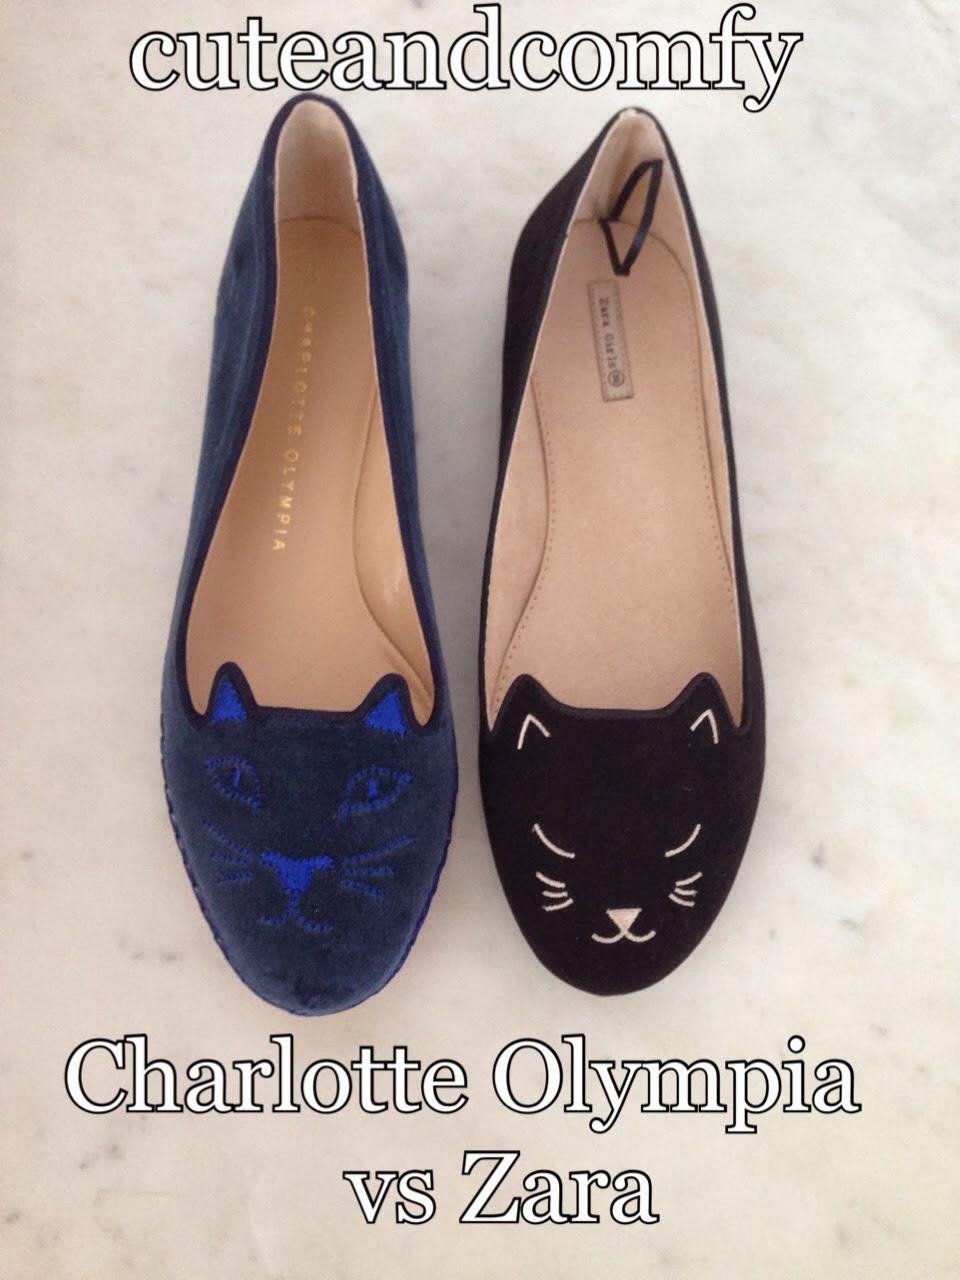 Cute And Comfy Kitty Flats Charlotte Olympia Vs Zara